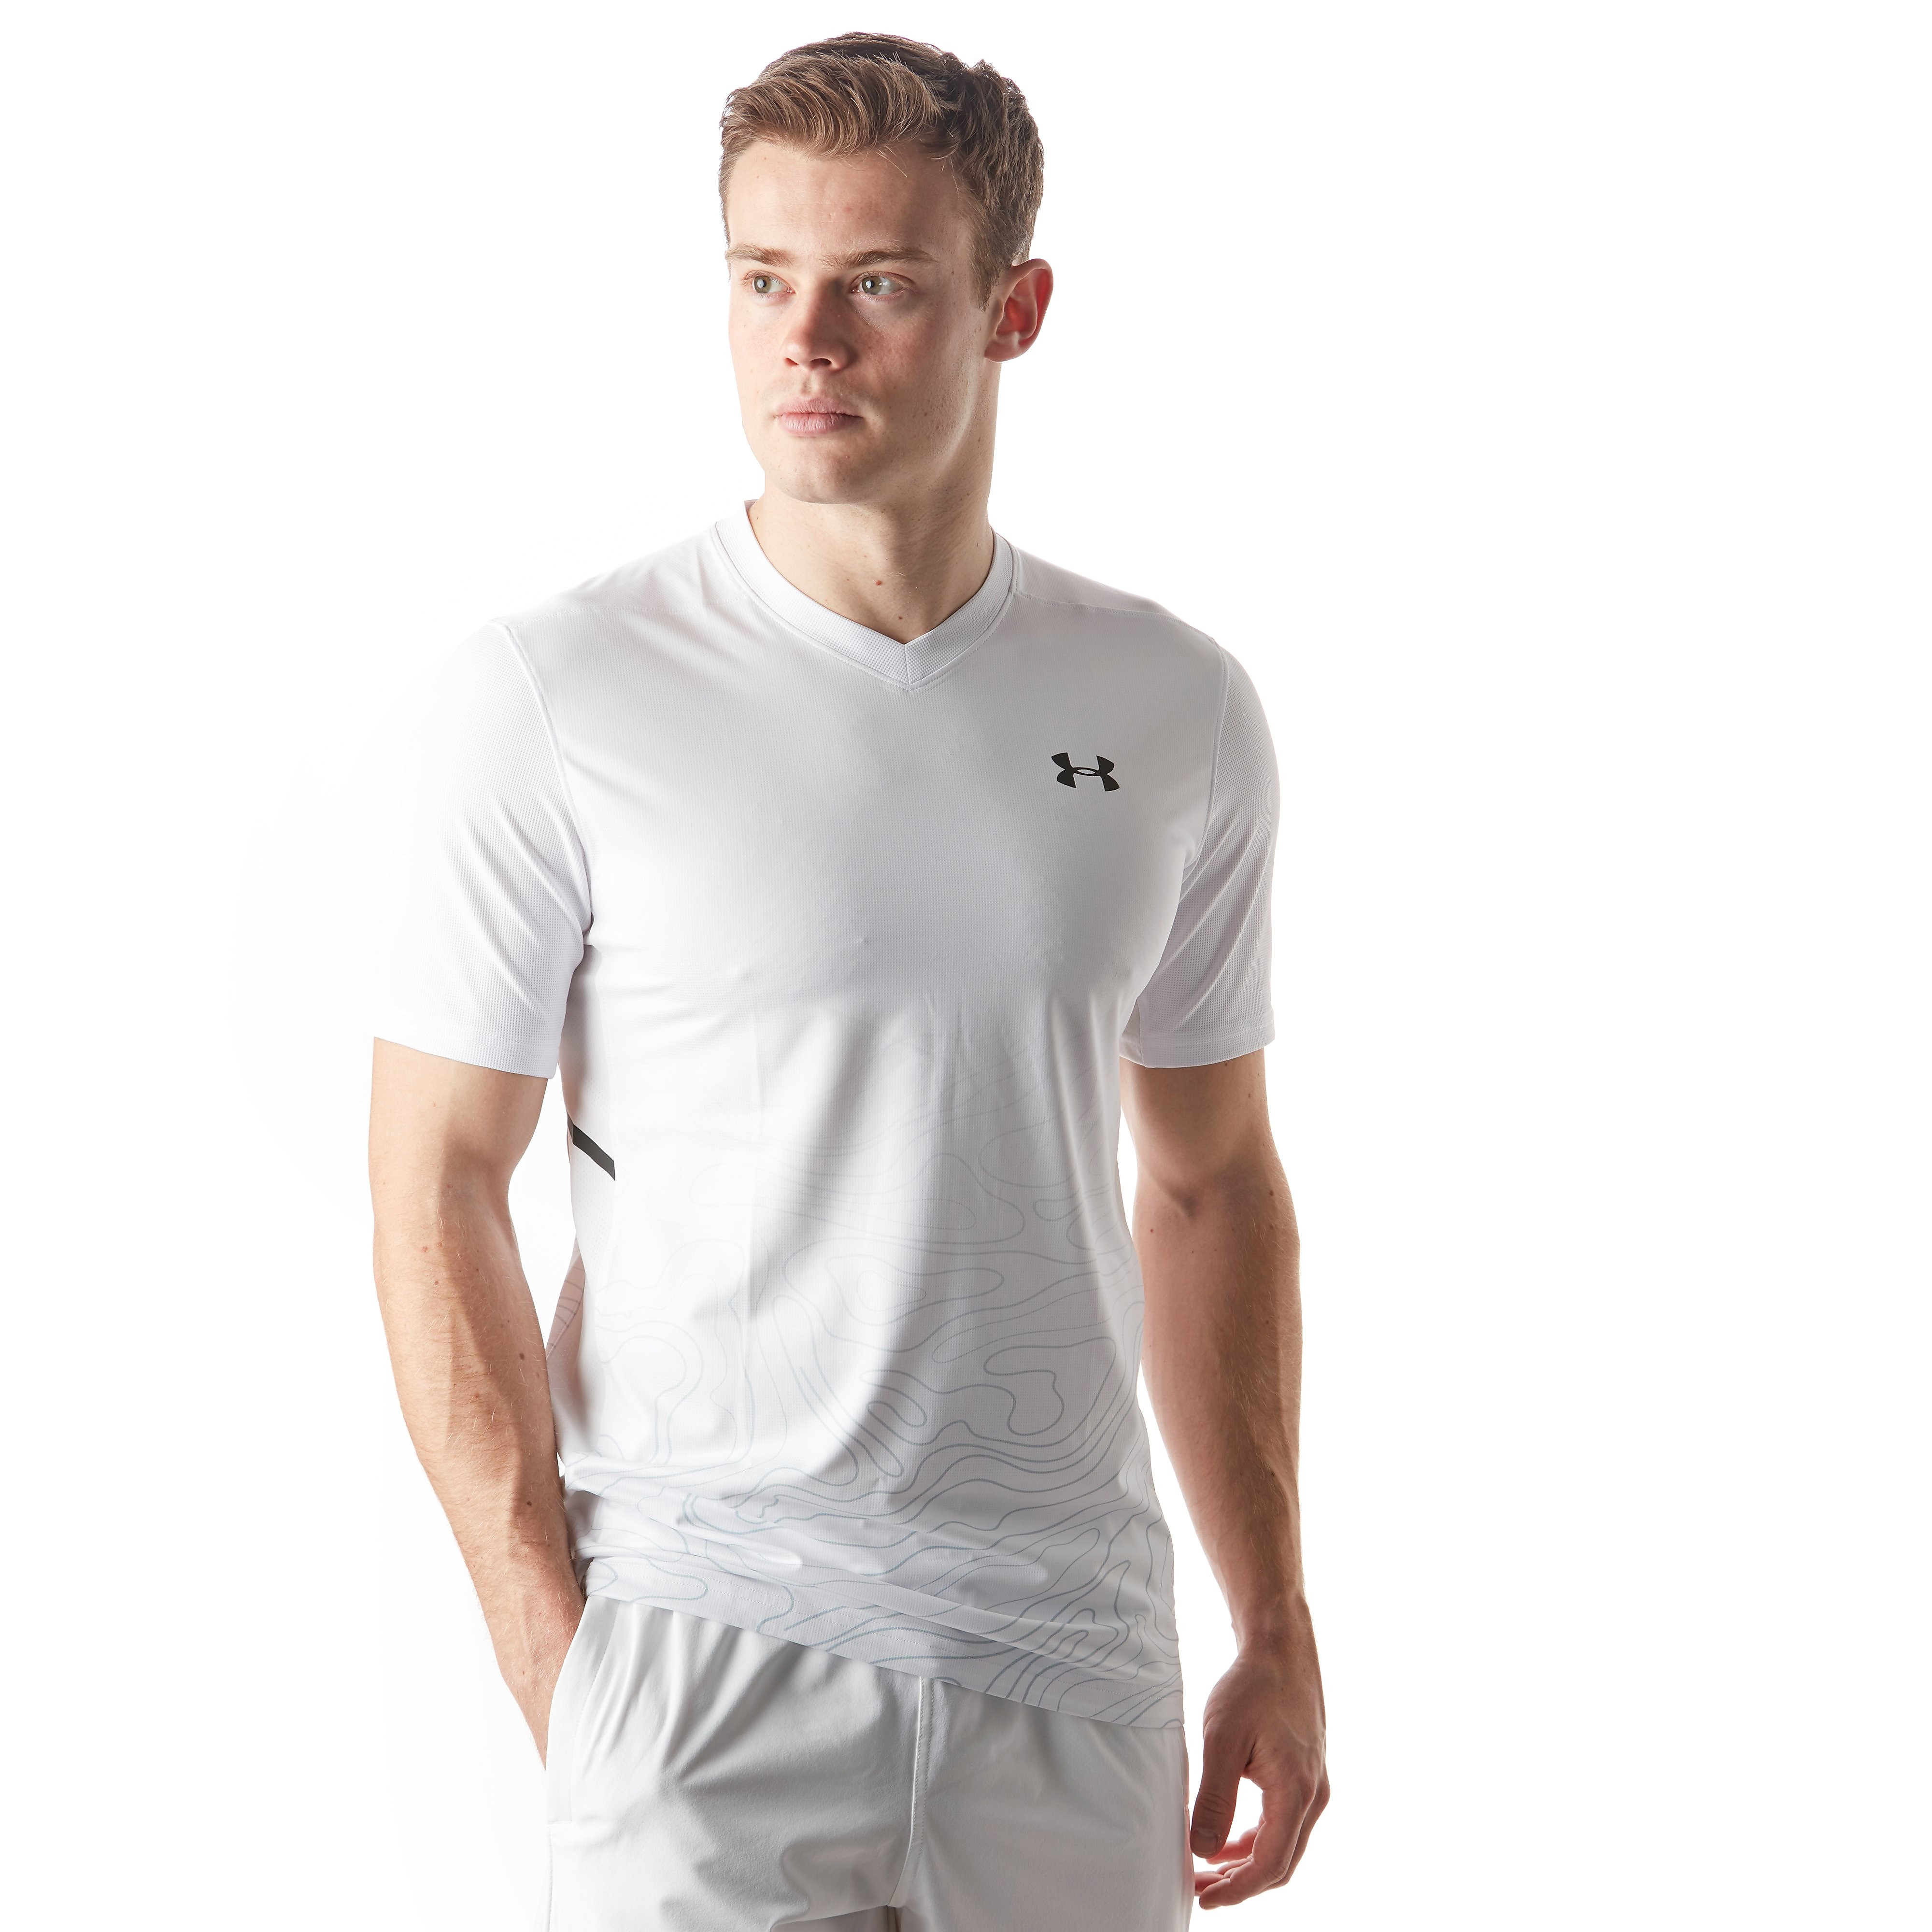 Mens White Under Armour Forge V-Neck Tennis T-Shirt